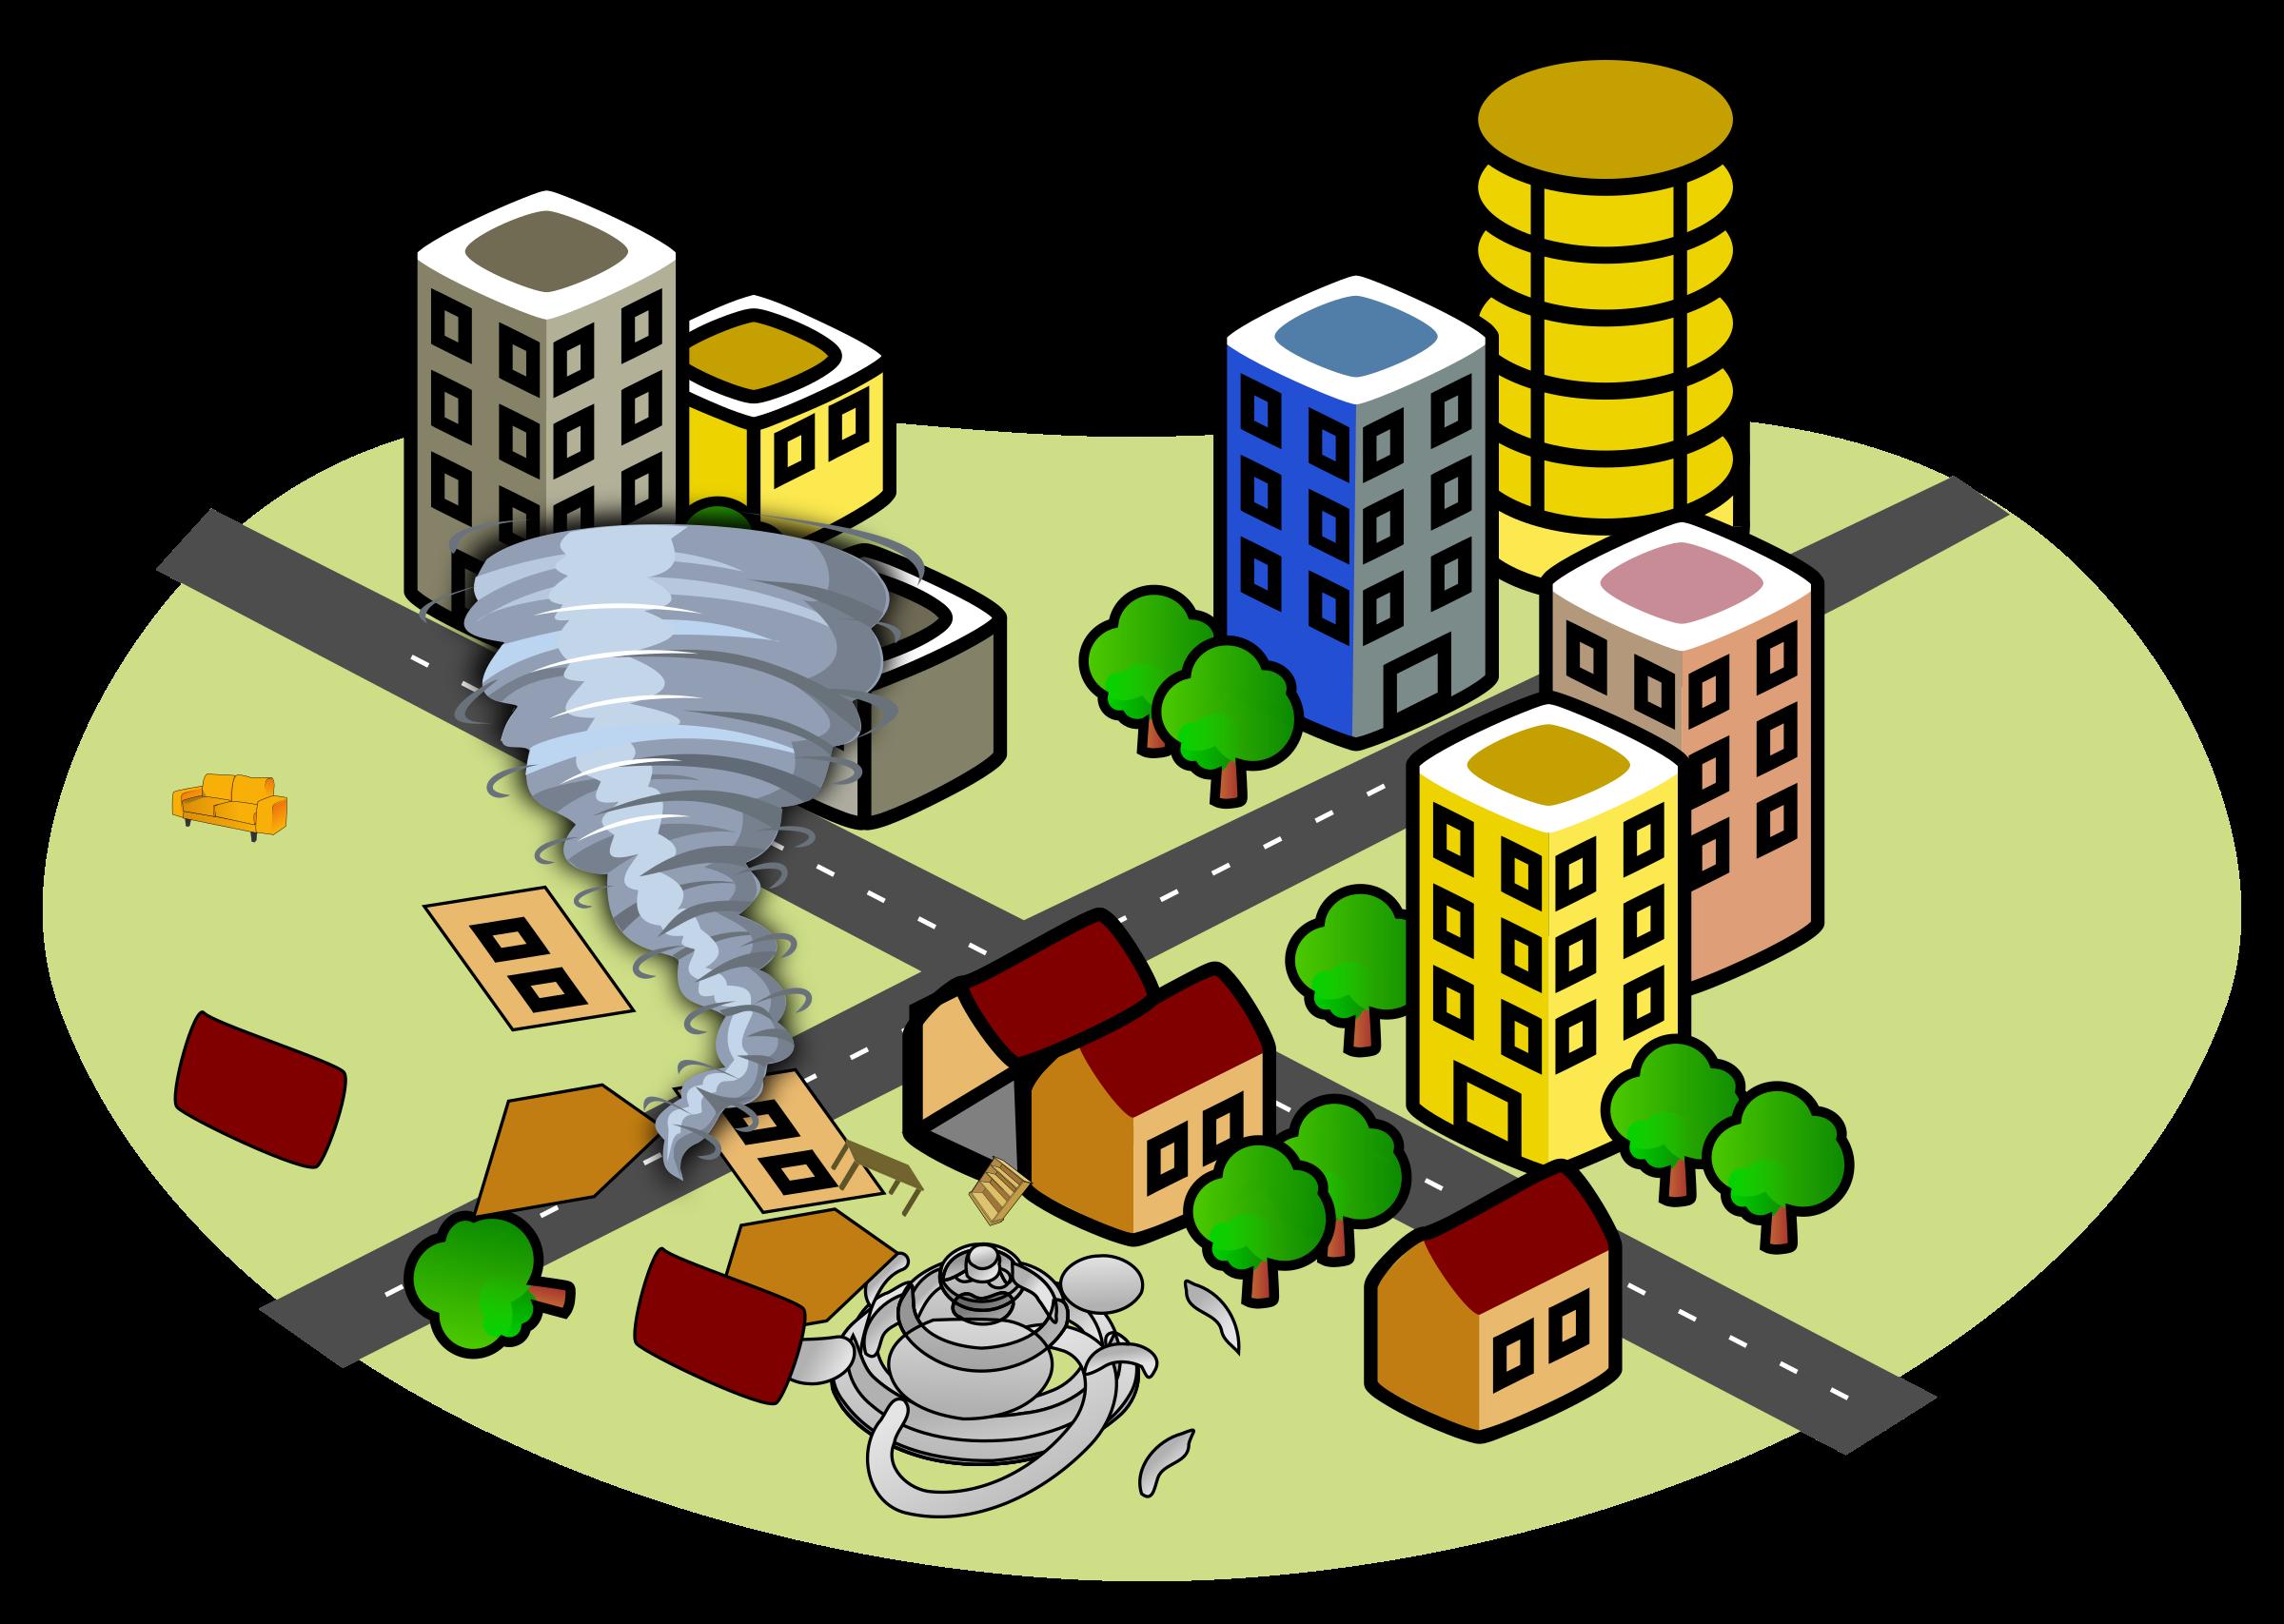 City with a big. Clipart house tornado